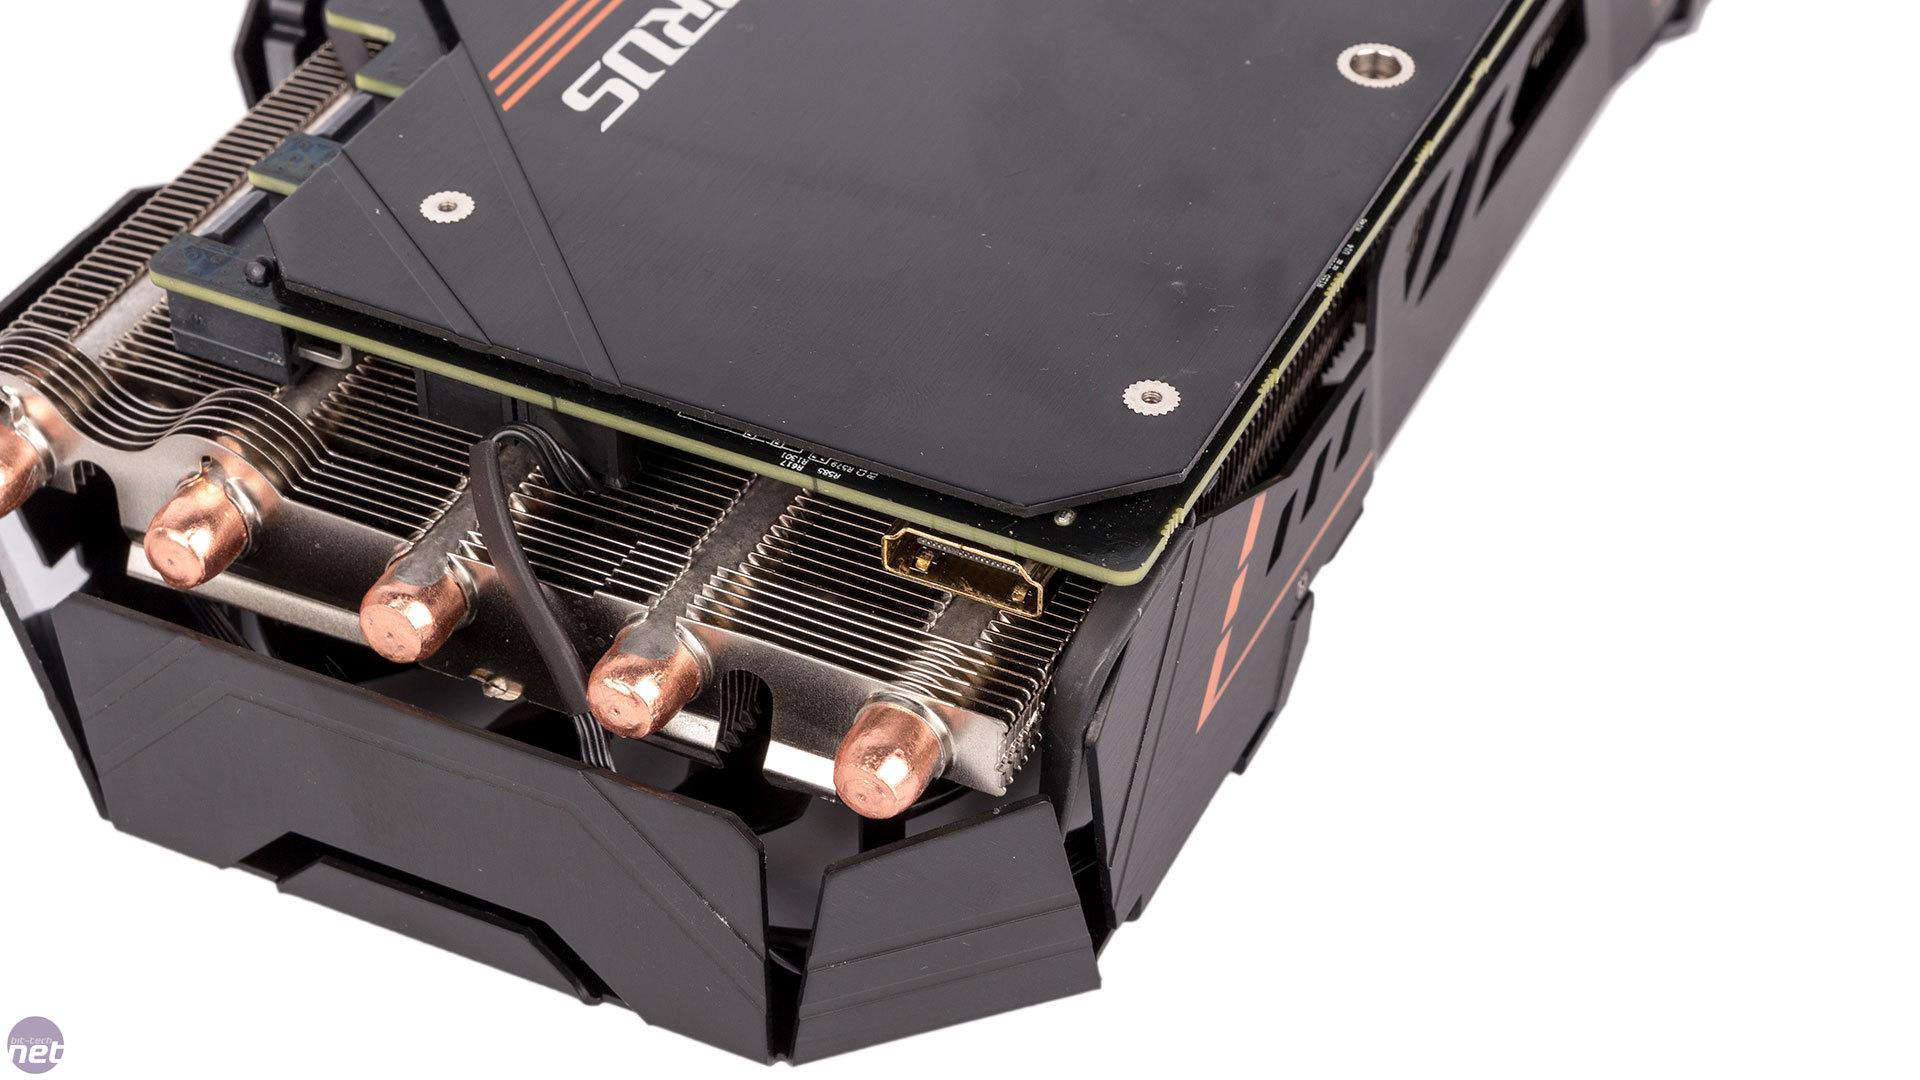 Aorus GeForce GTX 1080 Ti Review | bit-tech net